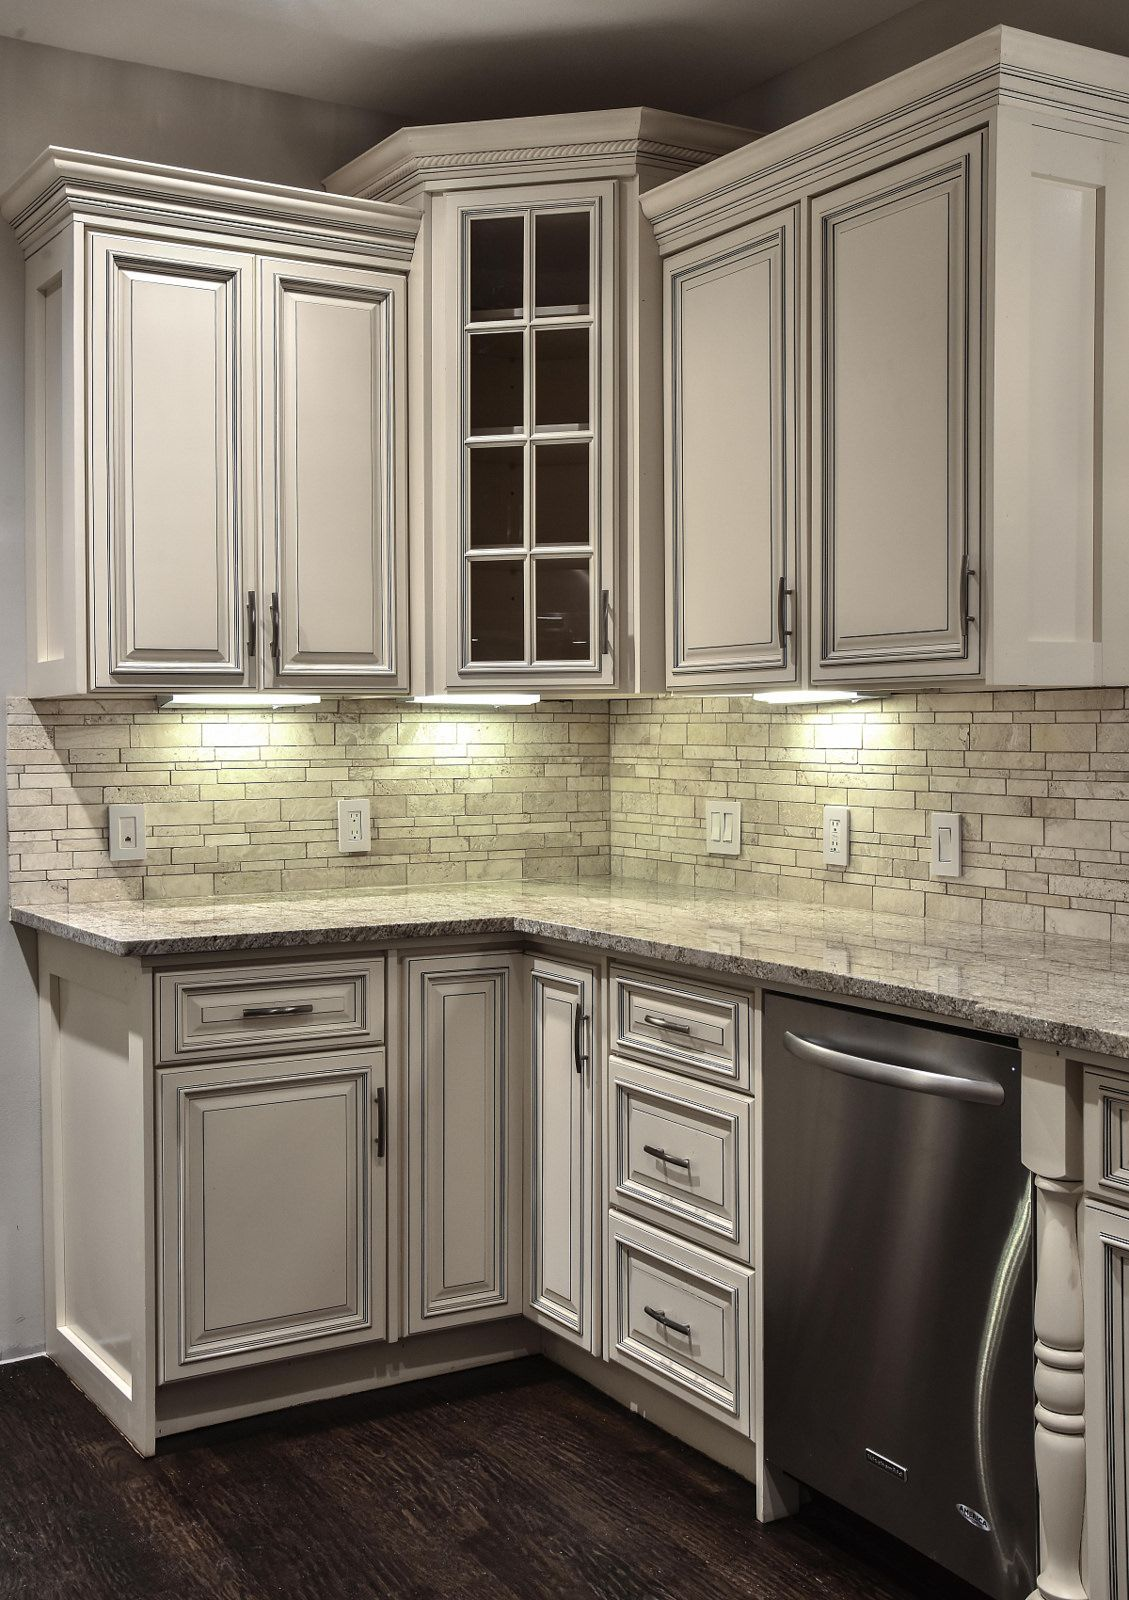 Signature Pearl In 2019 Kitchen Ideas Beige Kitchen Cabinets